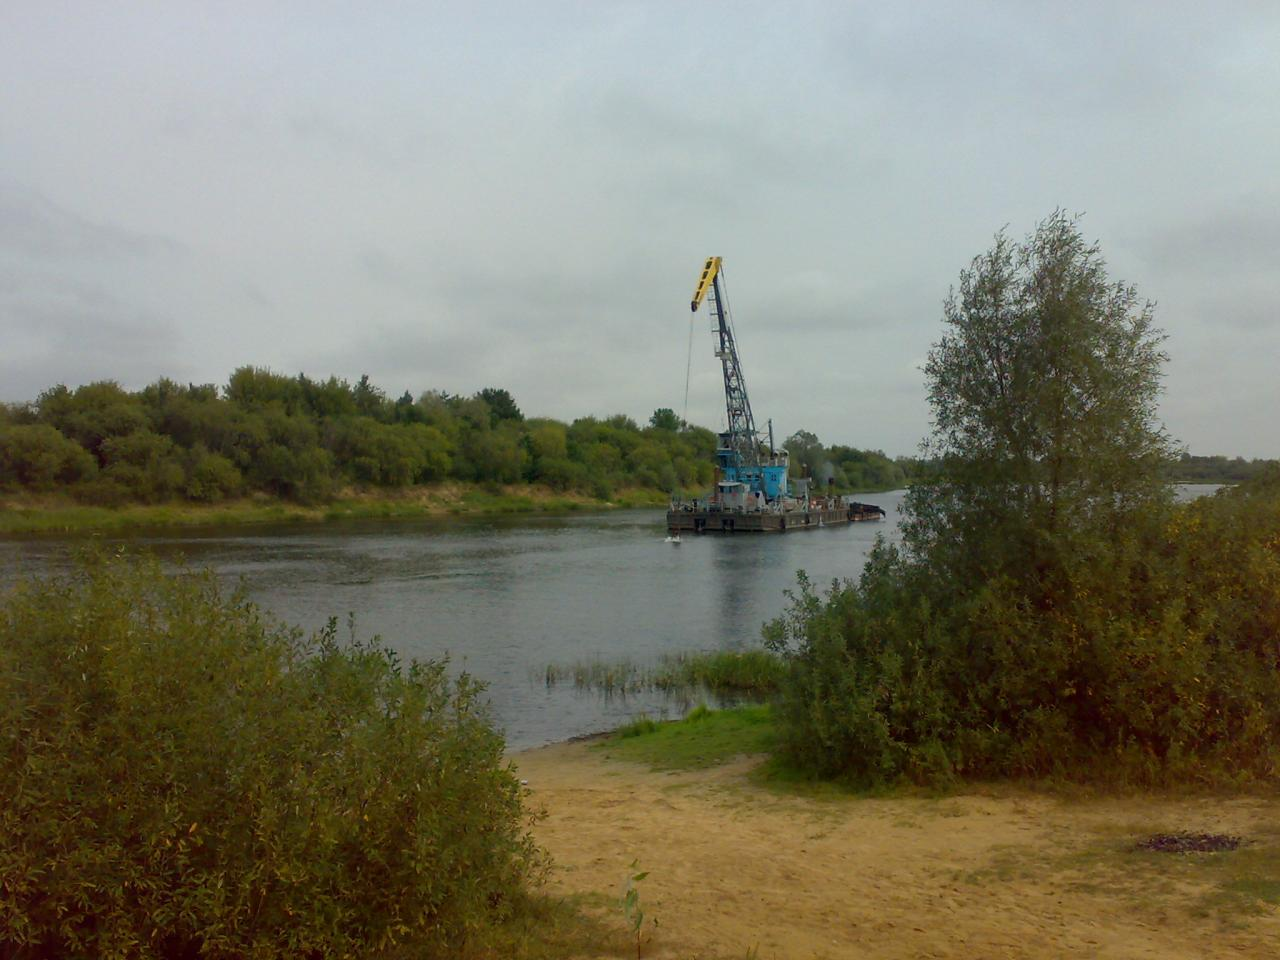 В последнее время не часто, но всё же ... | Отчеты о рыбалке в Беларуси